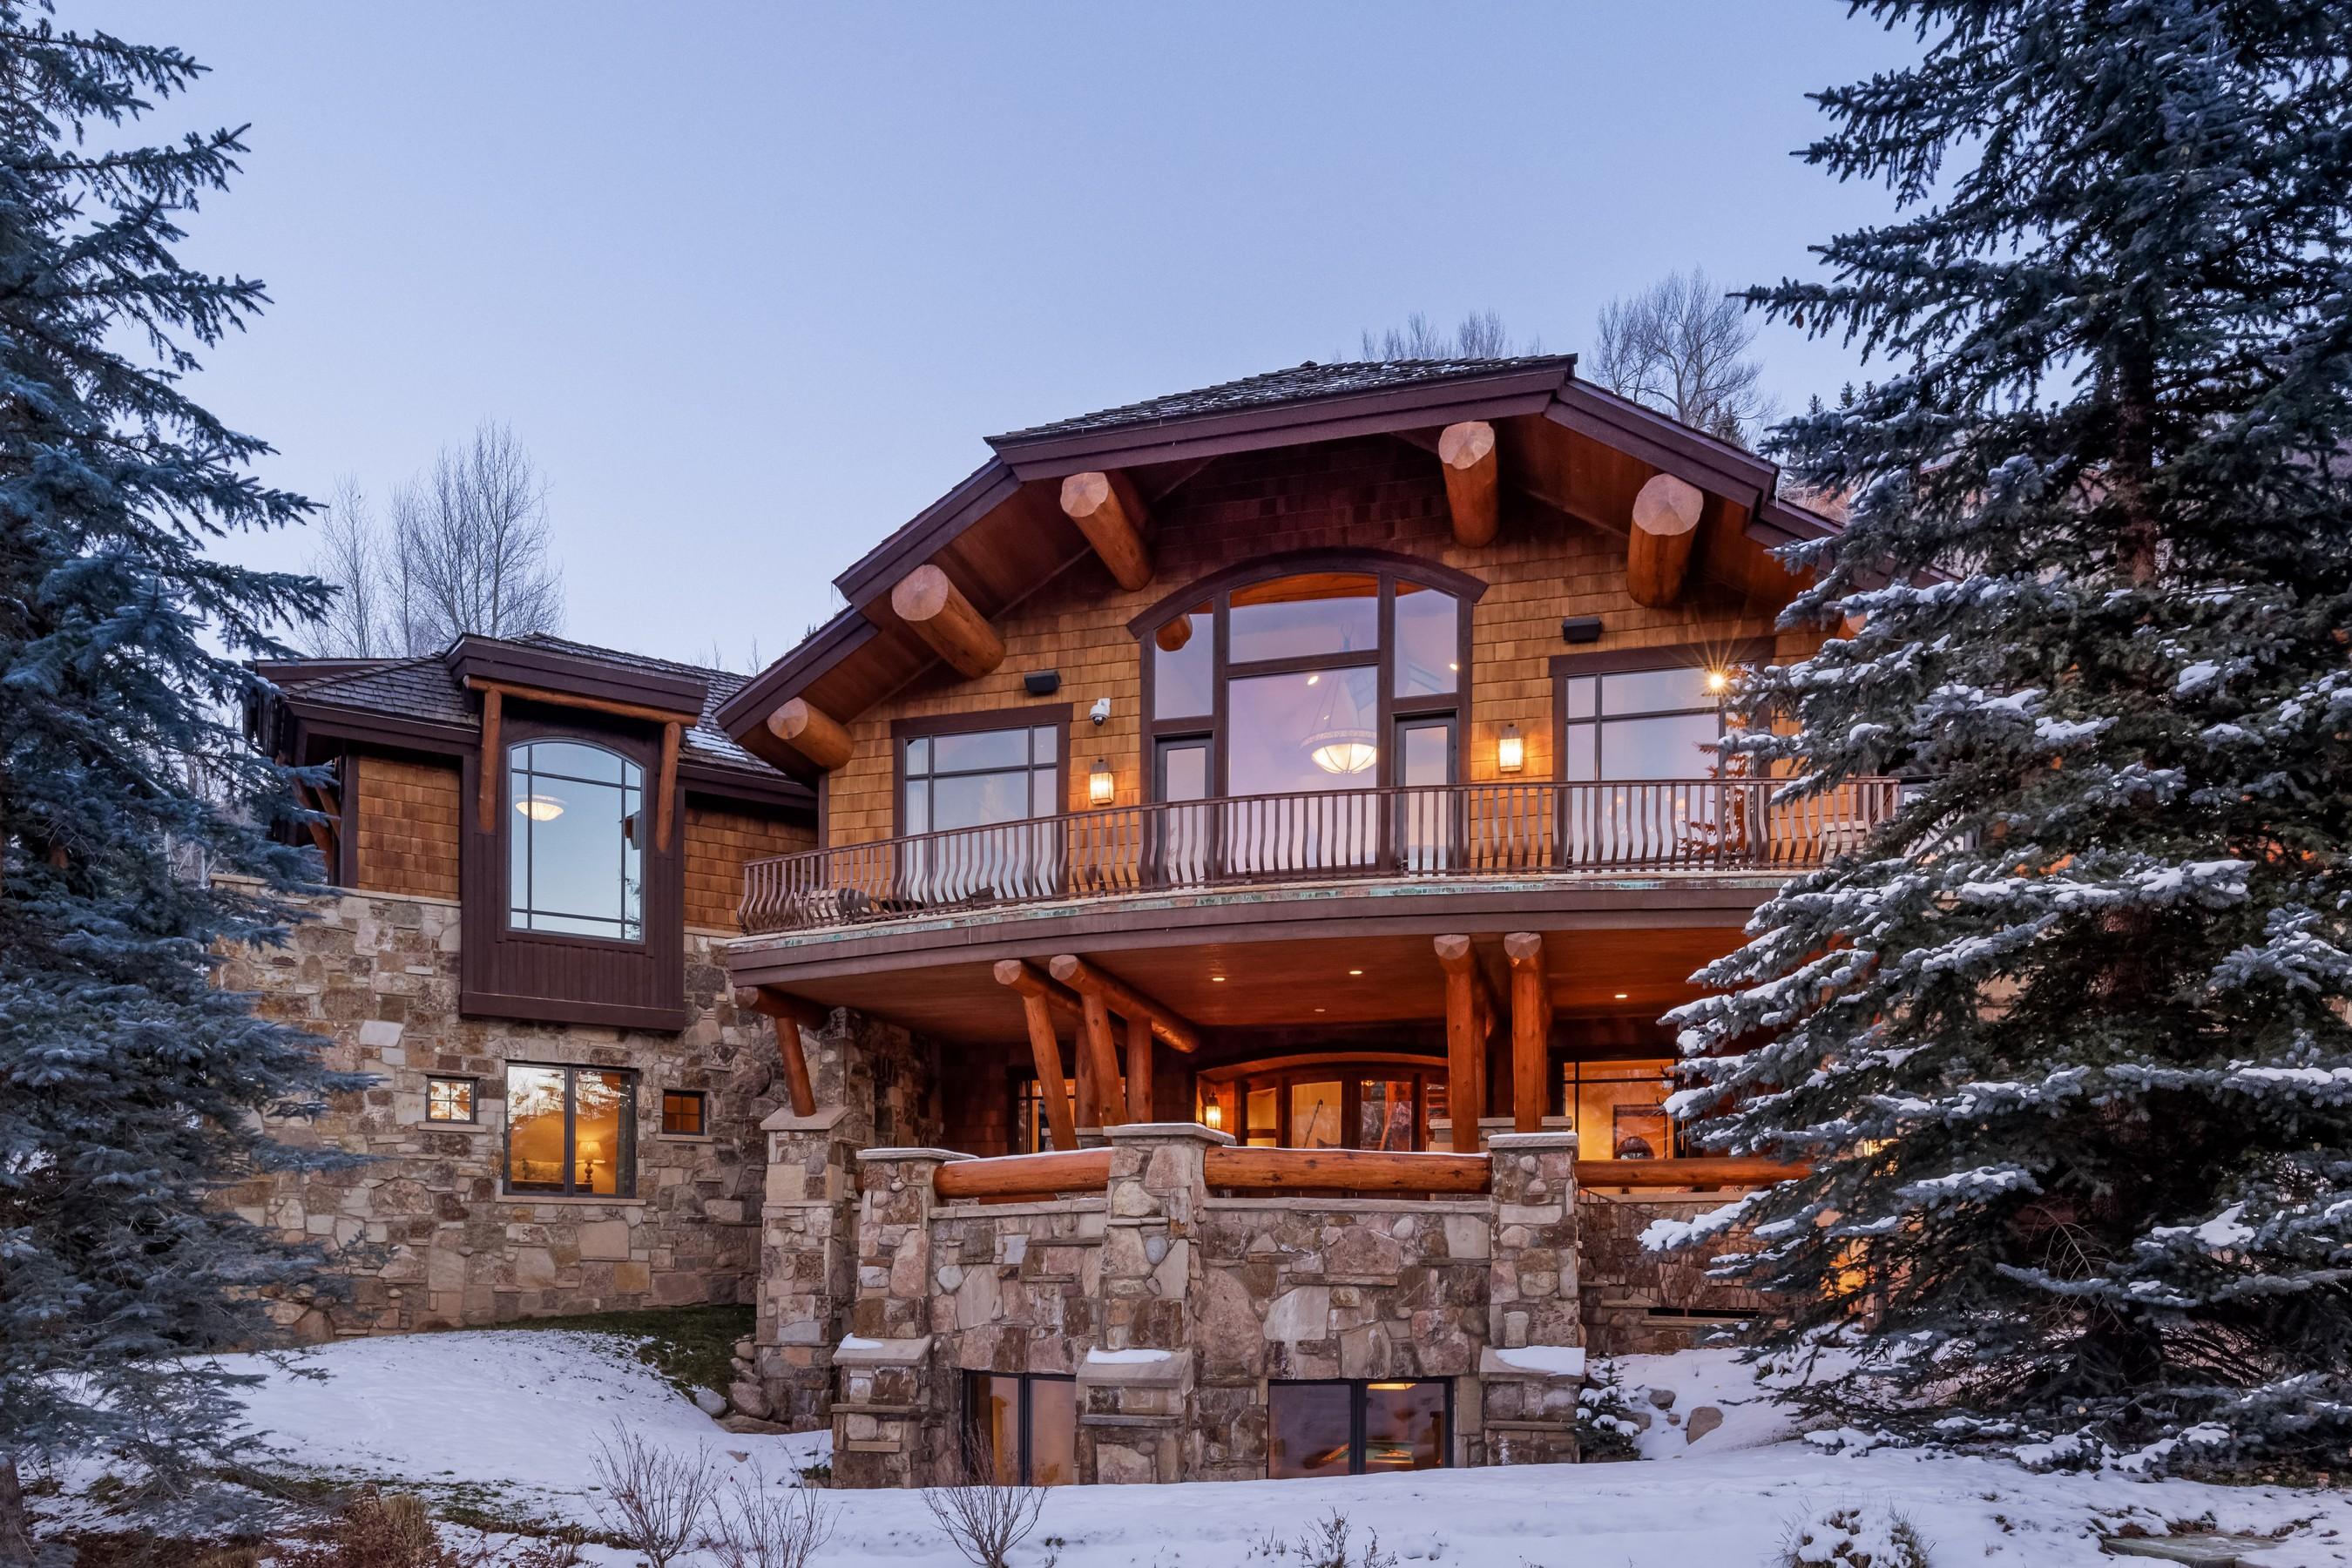 独户住宅 为 销售 在 Prestigious Willoughby Way 247 Willoughby Way 阿斯彭, 科罗拉多州, 81611 美国